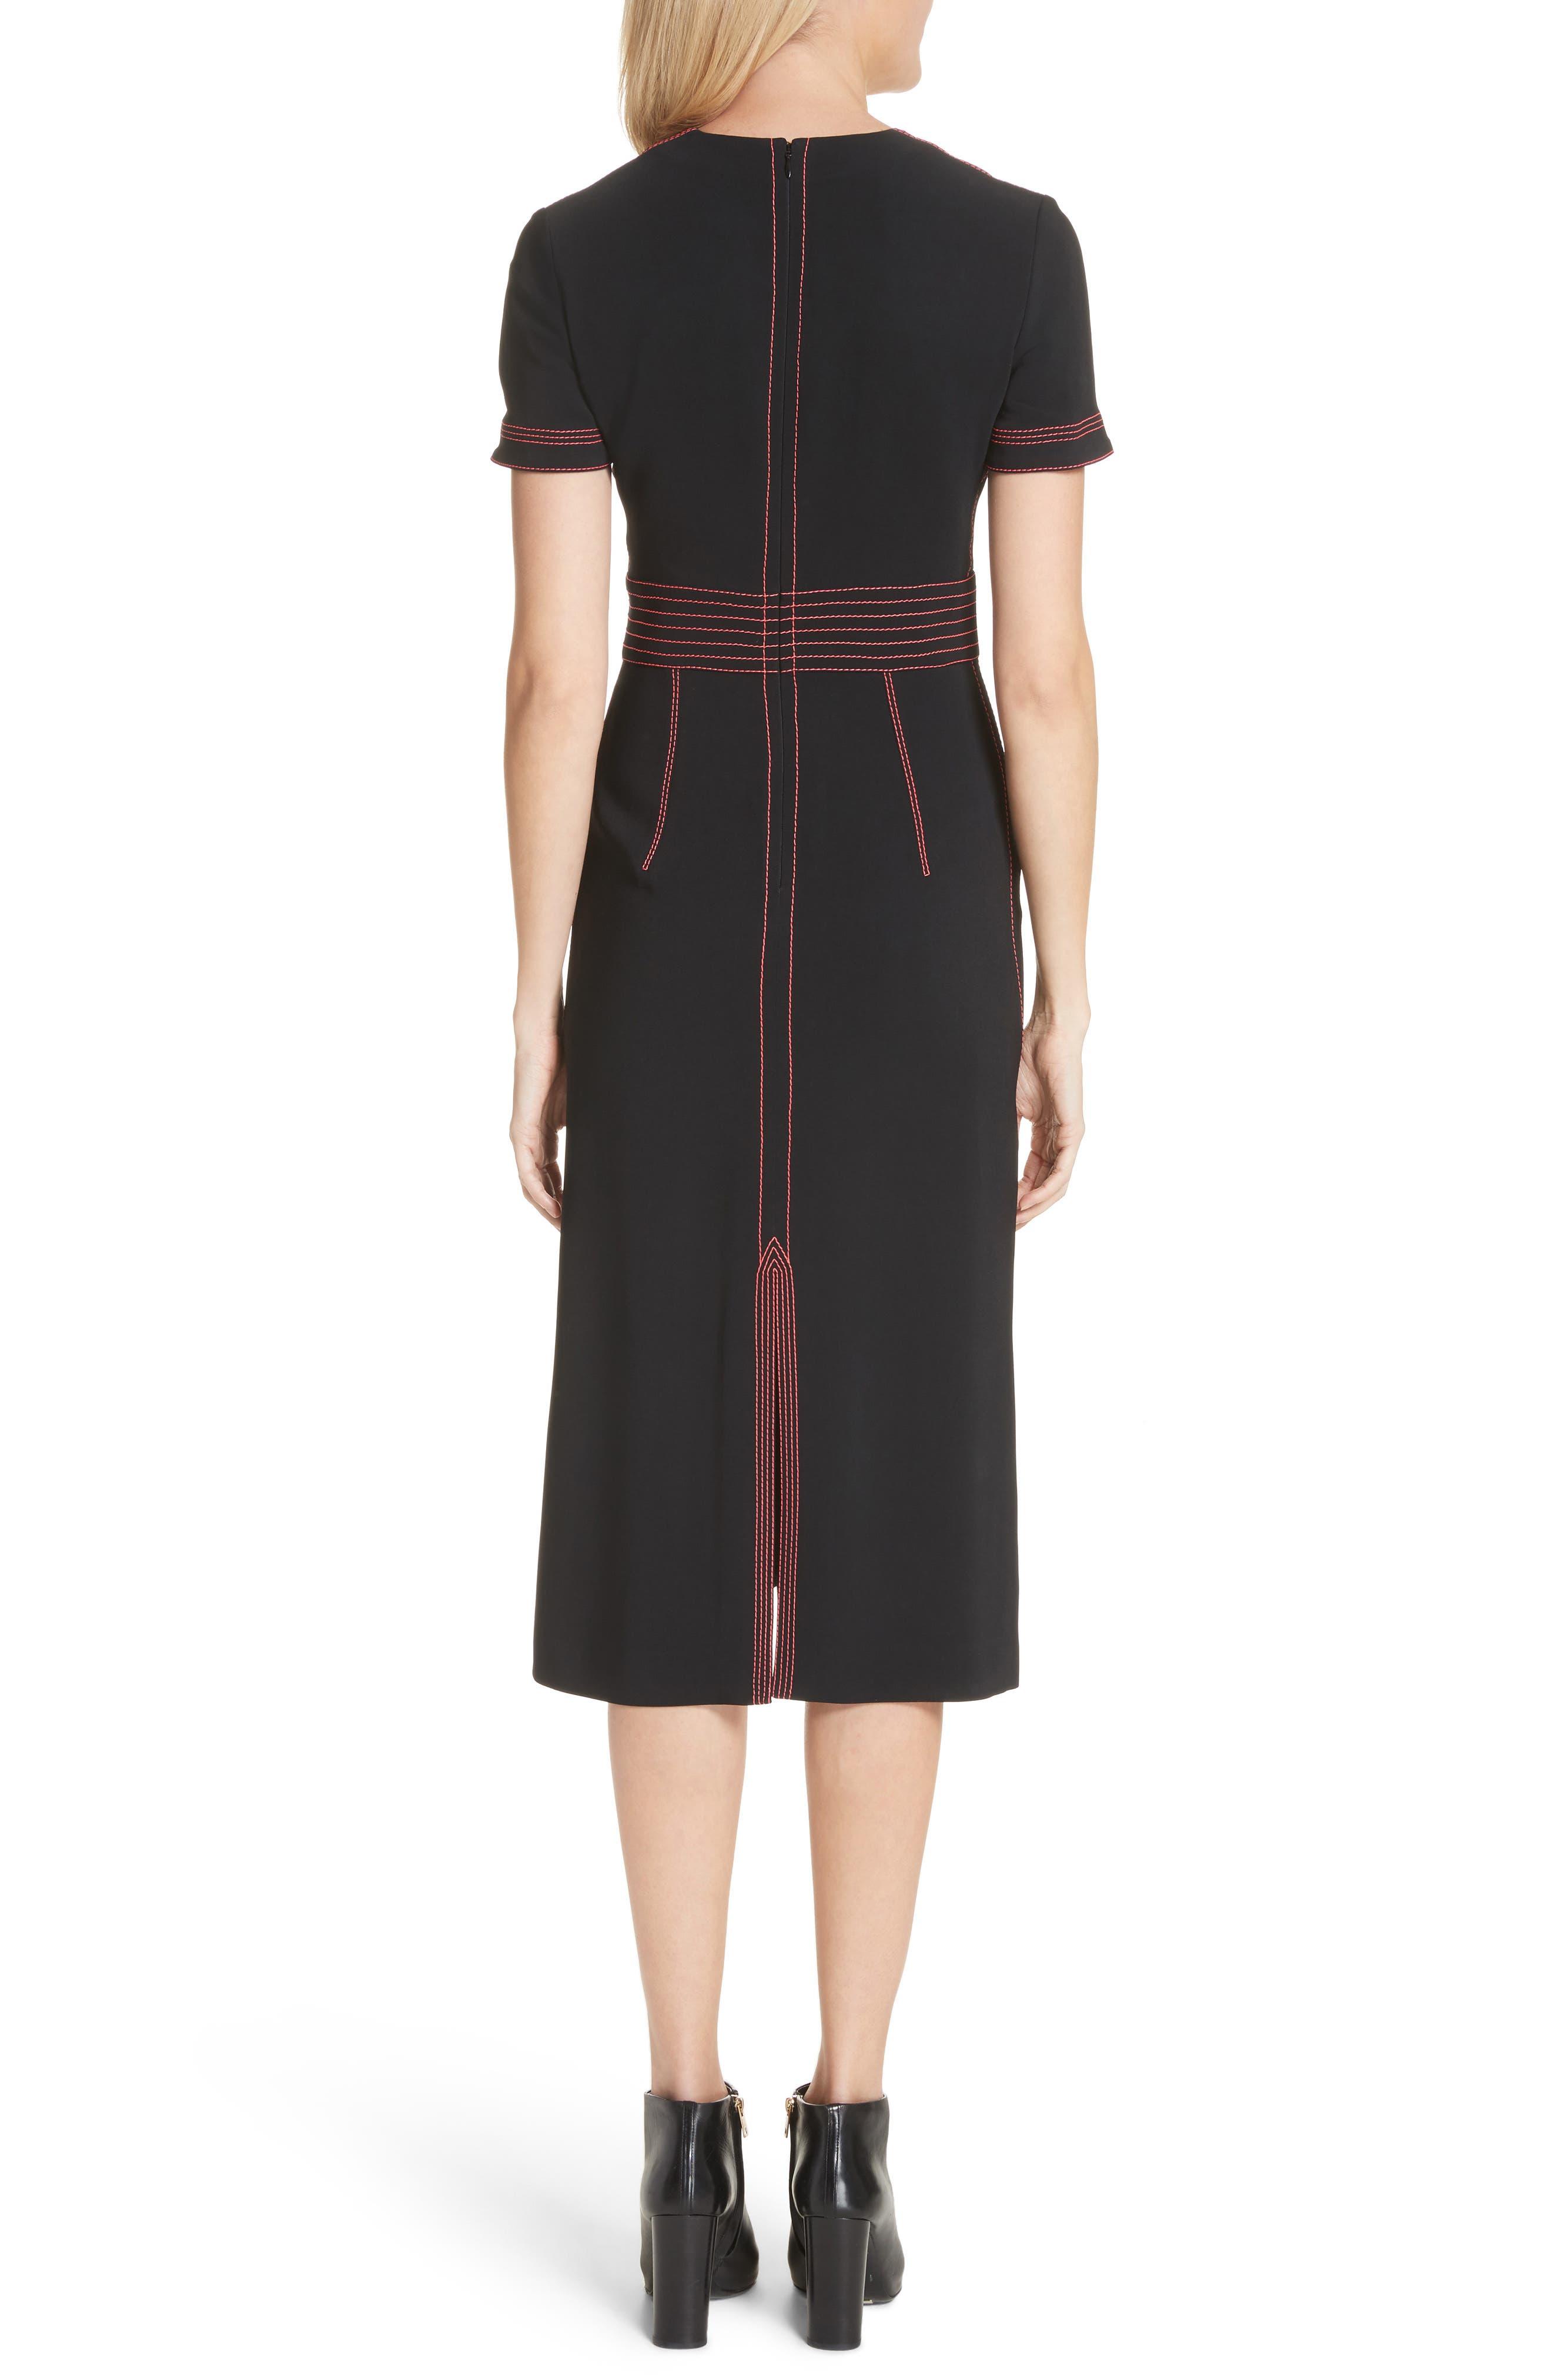 Benni Topstitched Midi Dress,                             Alternate thumbnail 2, color,                             001